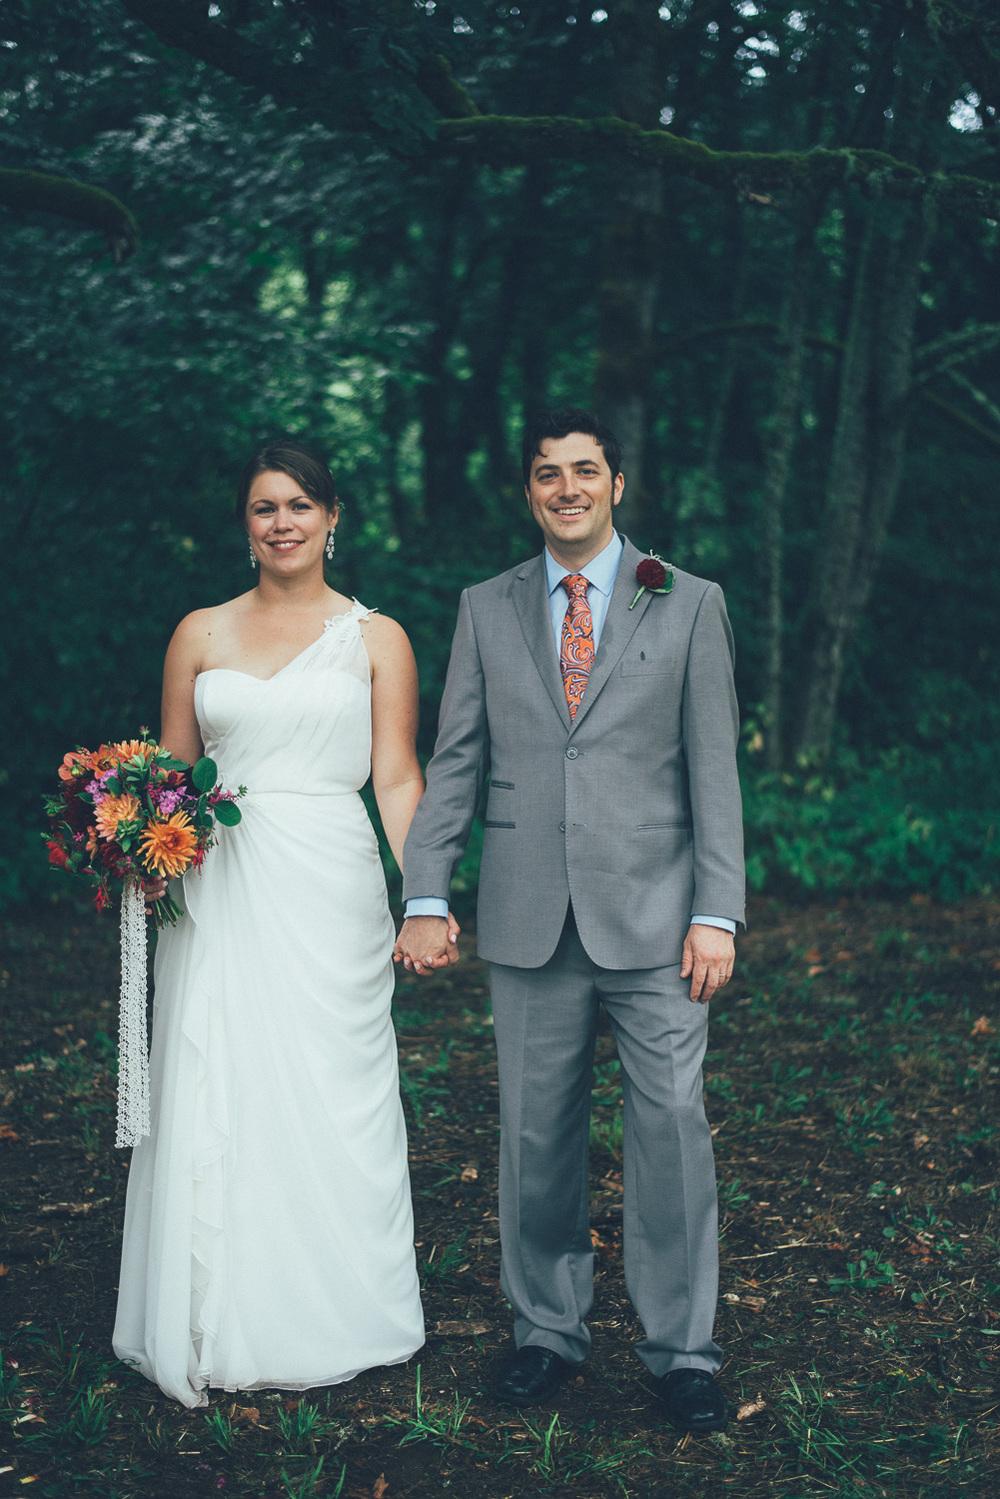 vashon_island_wedding_lennon_marissa-4756.jpg